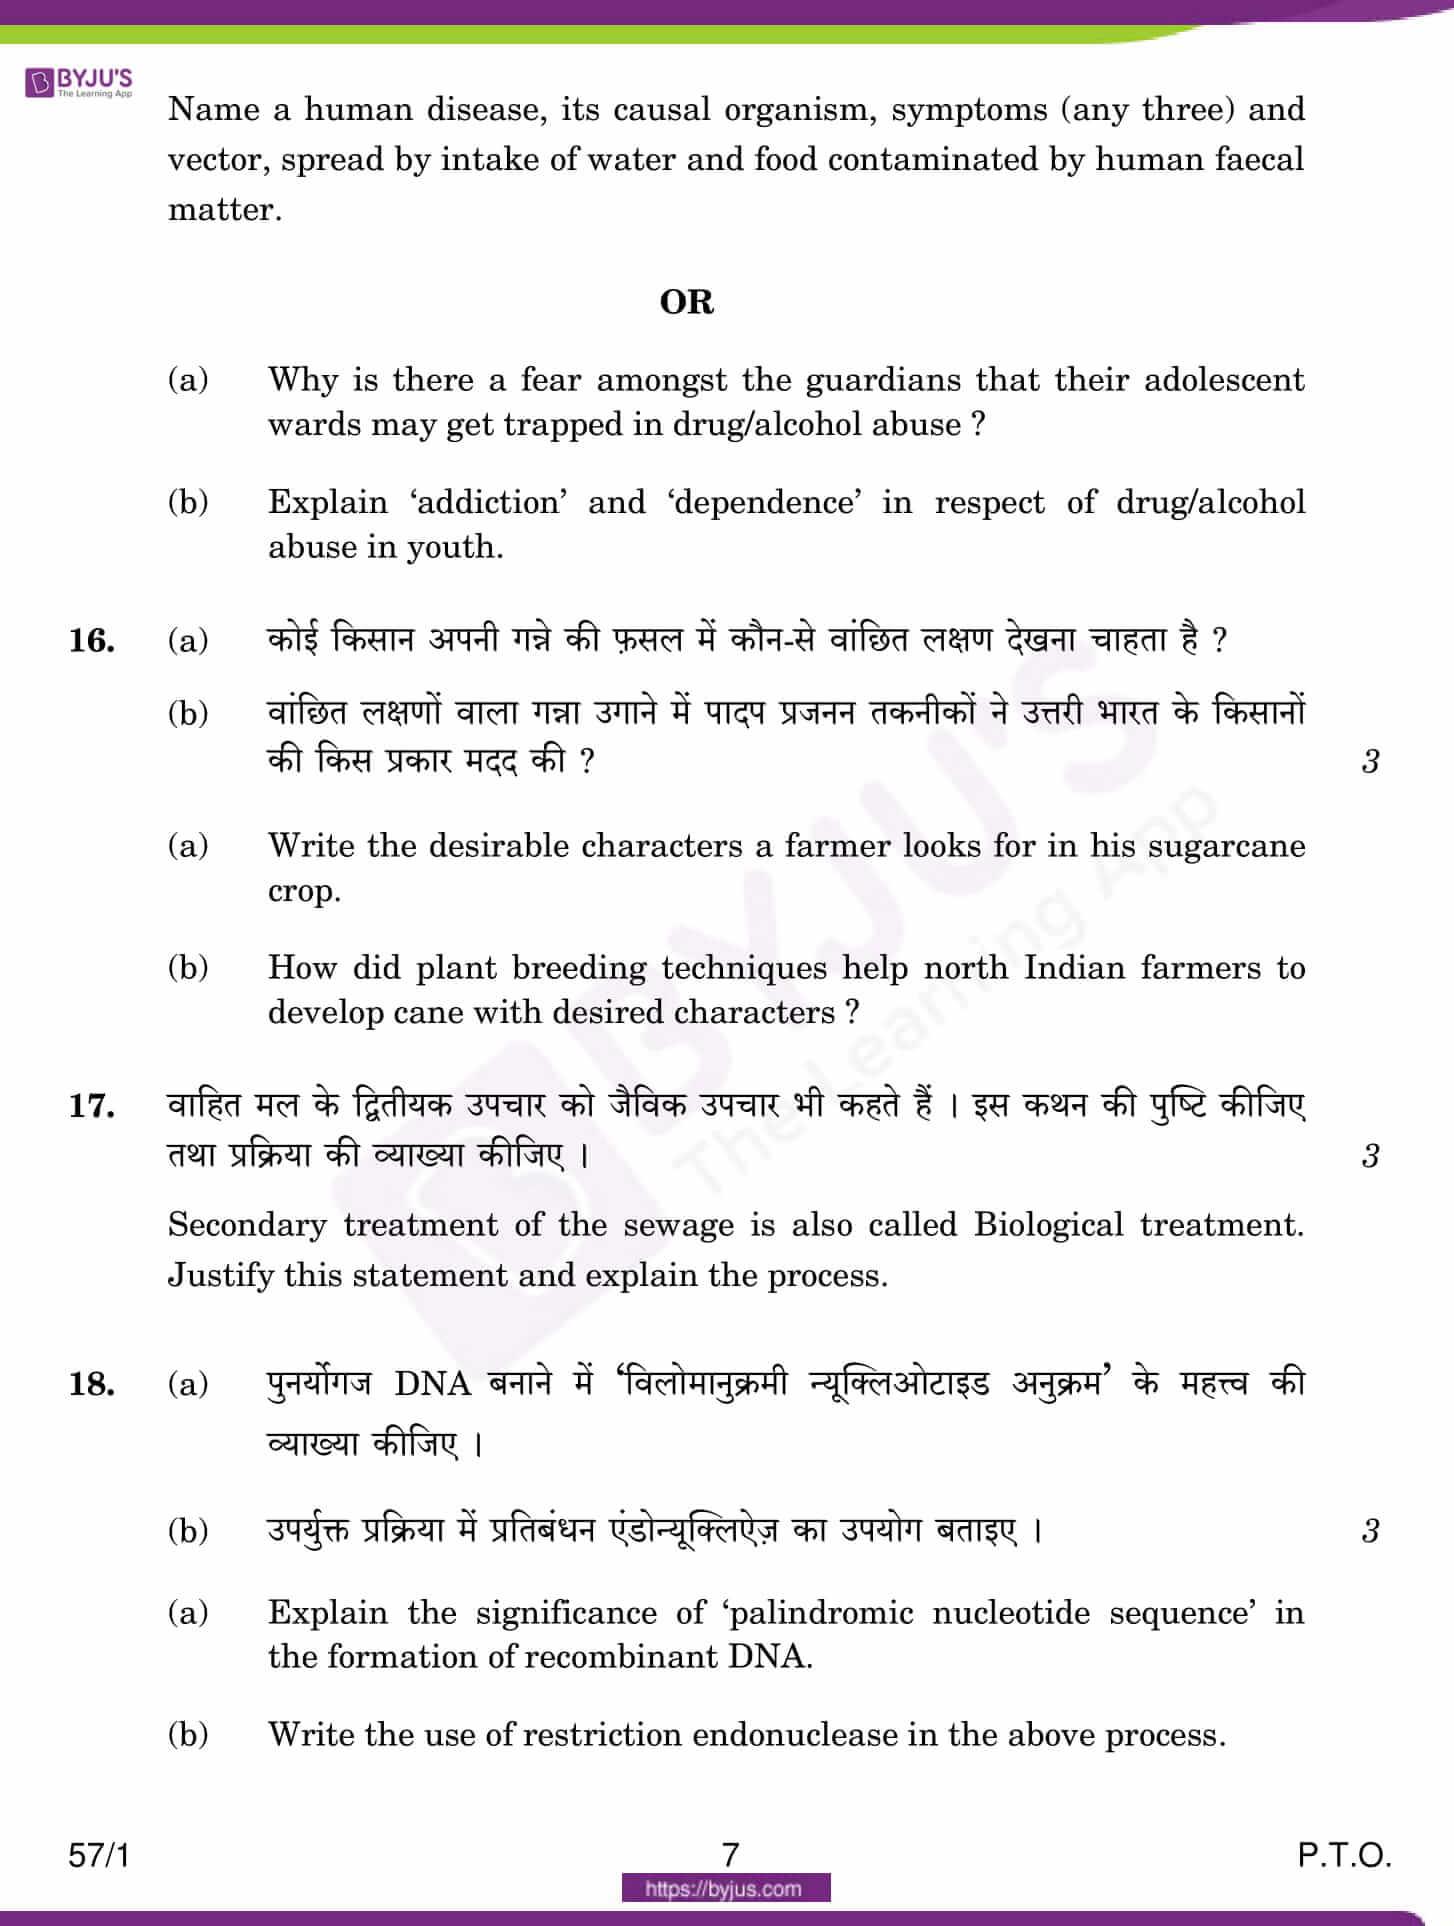 cbse class 12 qs paper 2017 bio set 1